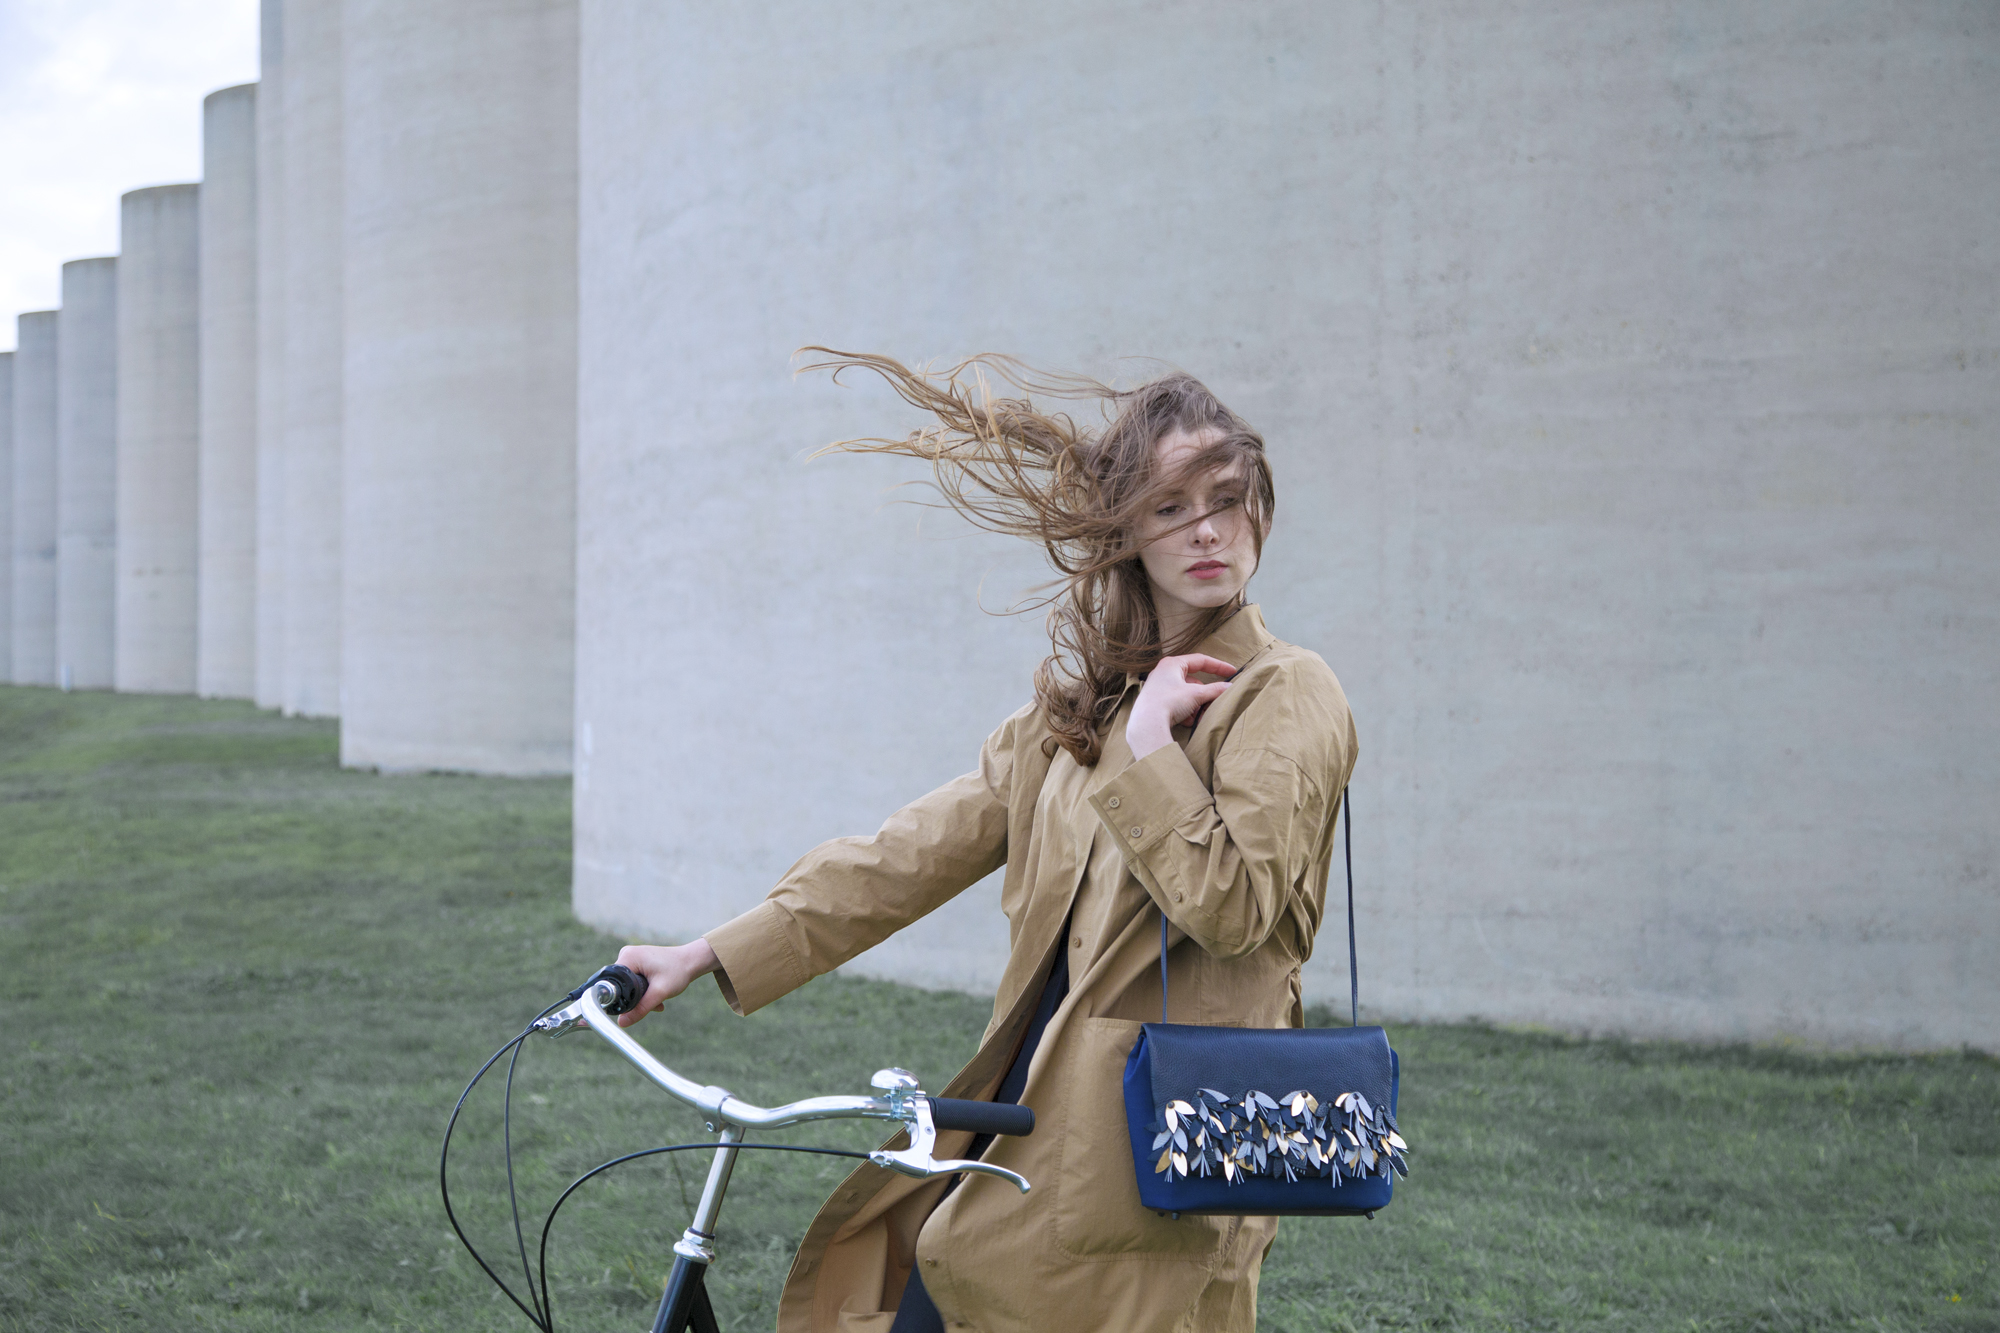 The-Cyclist_Pauline04.jpg